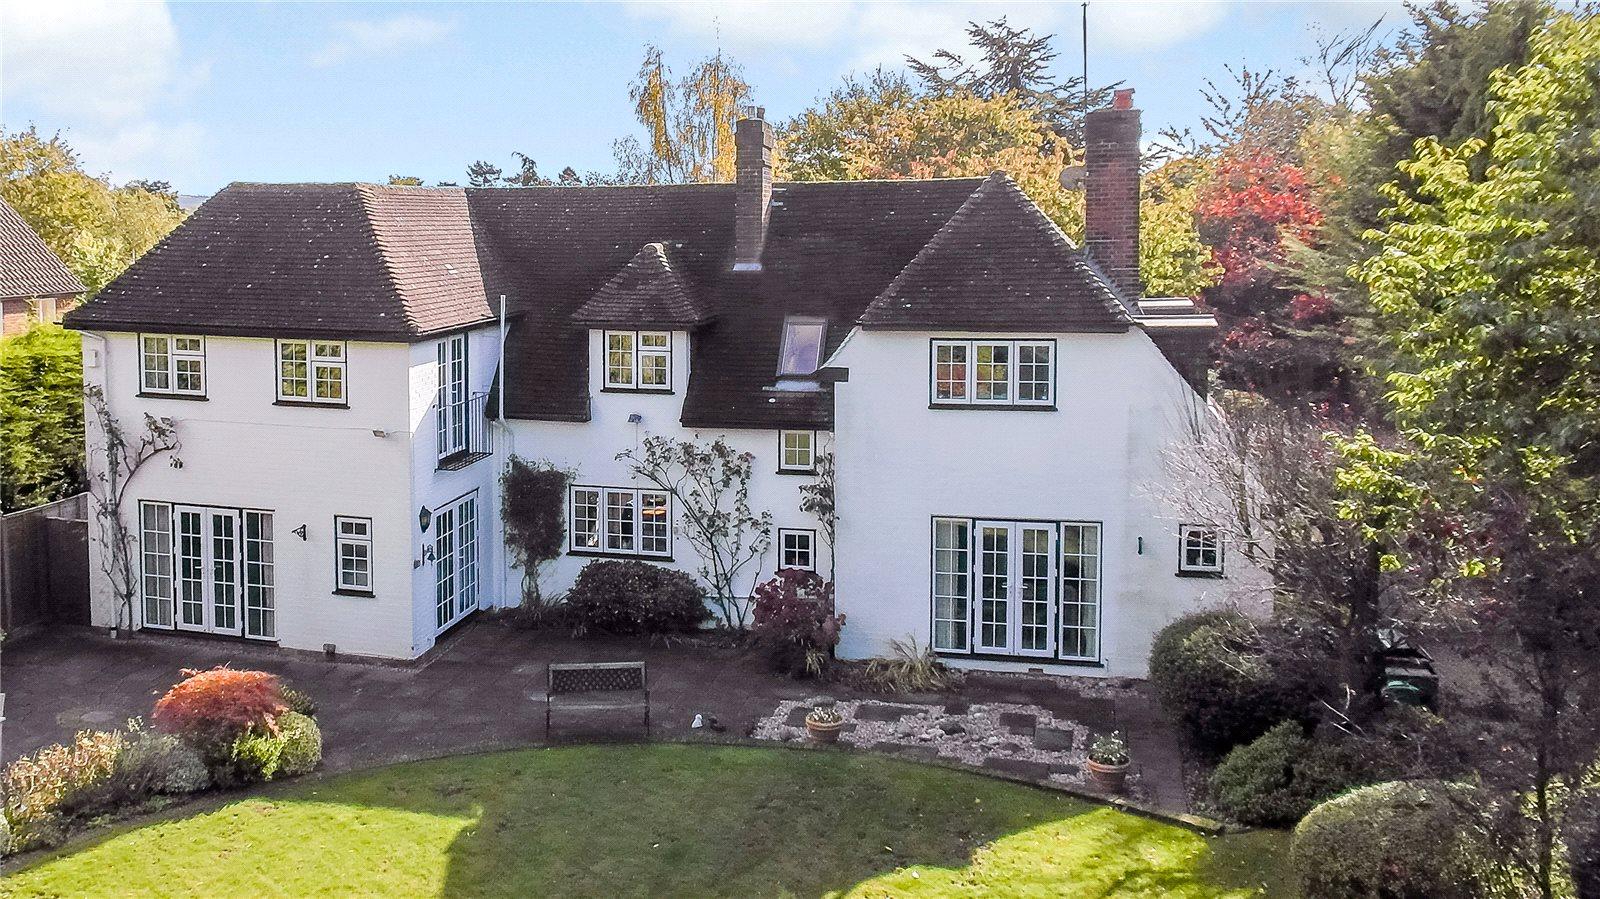 Single Family Home for Sale at Stewart Road, Harpenden, Hertfordshire, AL5 Harpenden, England